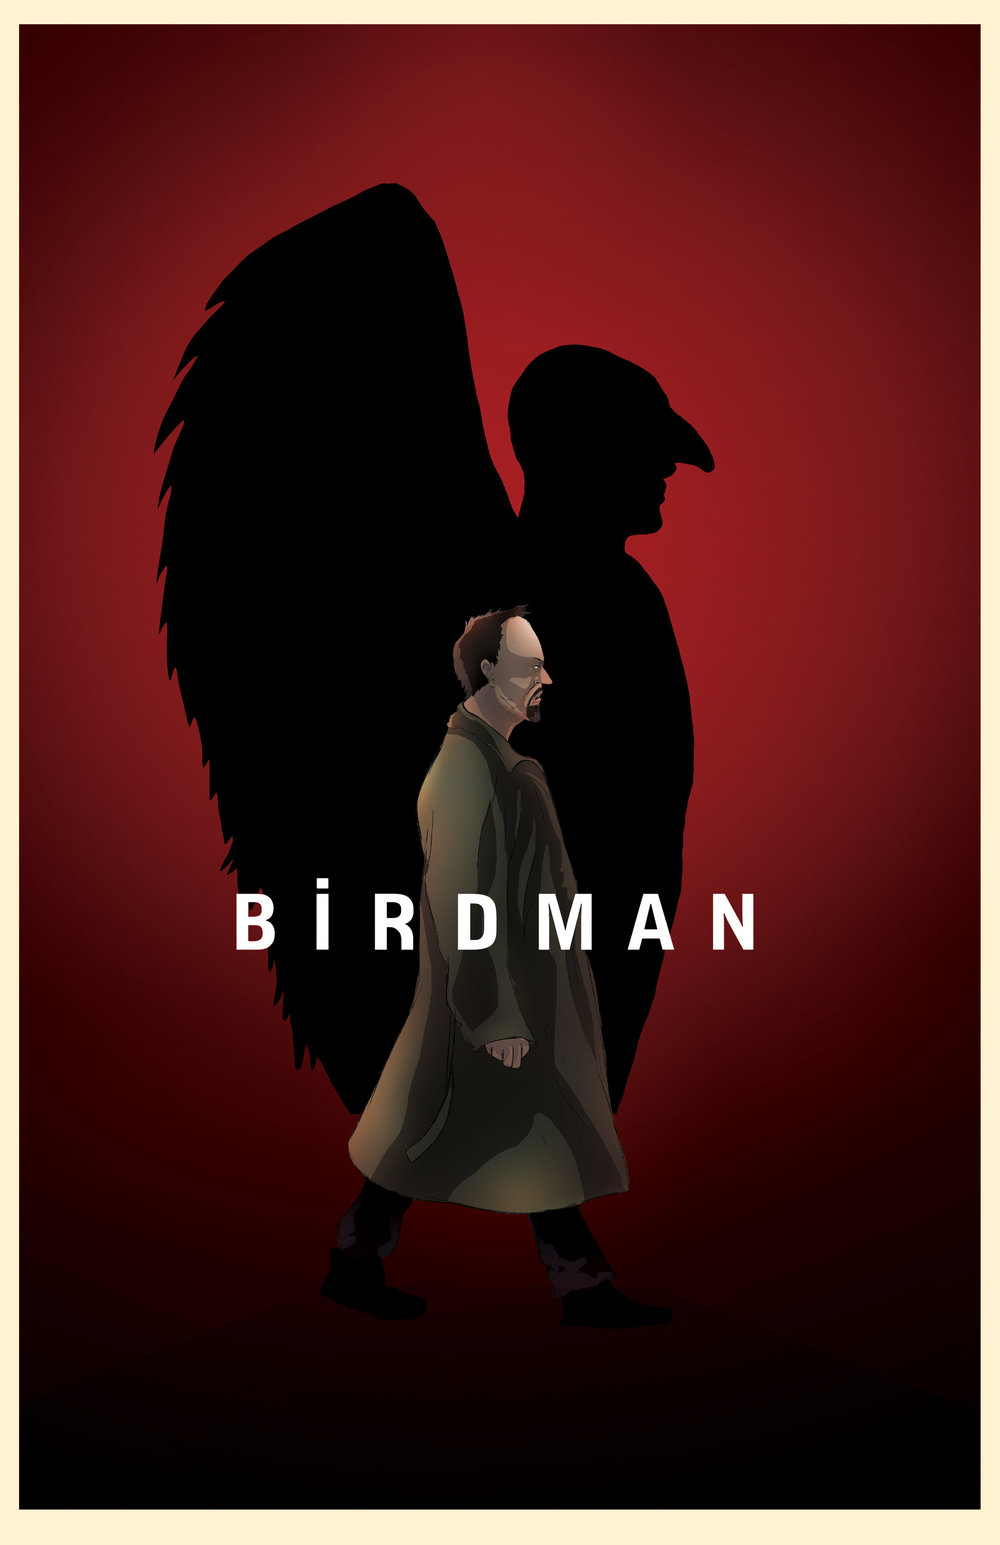 Birdman (The Unexpected Virtue of Ignorance) - Film Poster